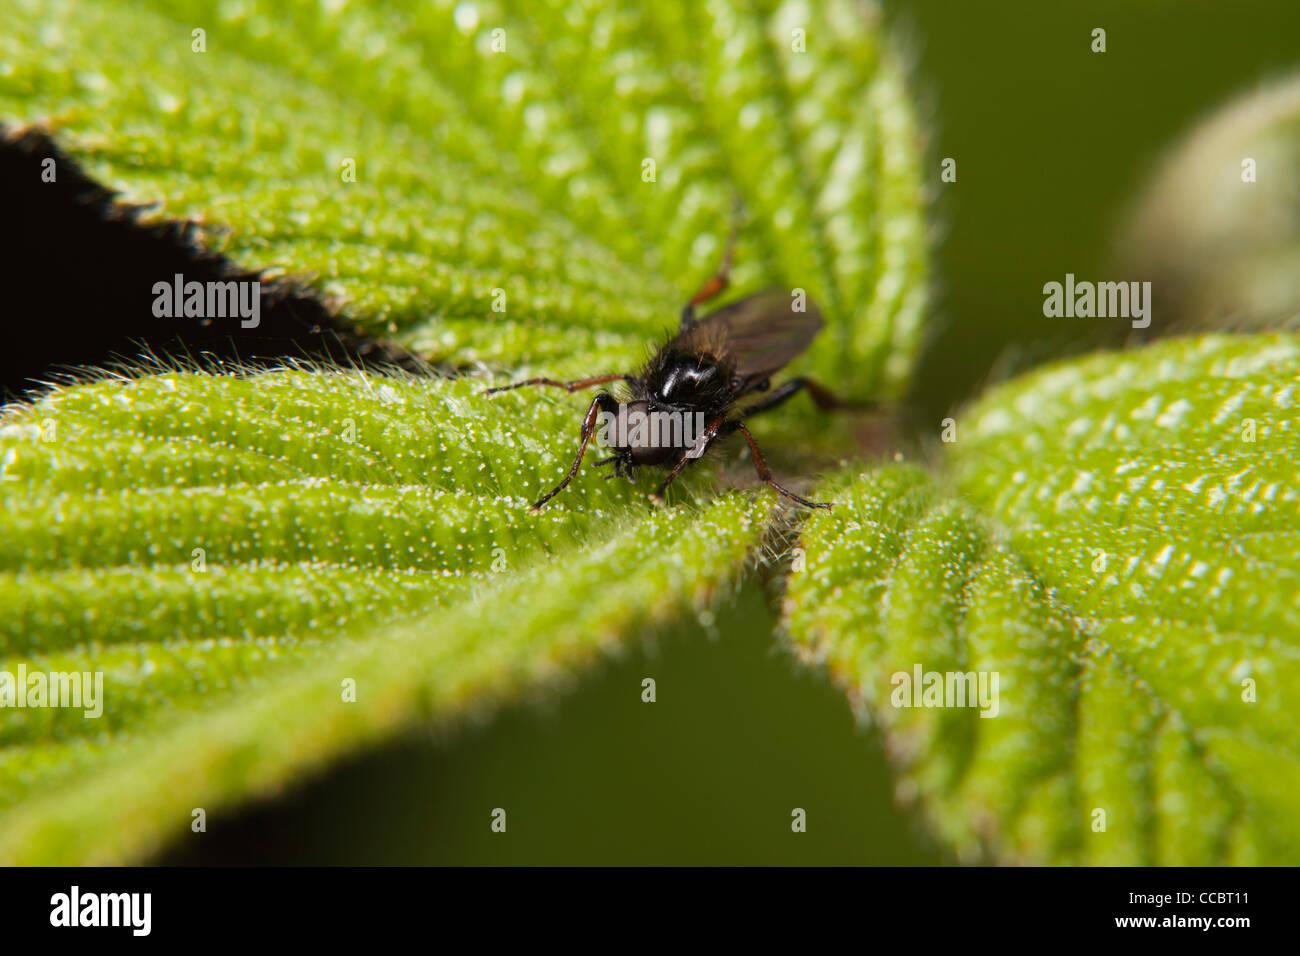 St. Mark's fly (Bibio marci) resting on plant - Stock Image